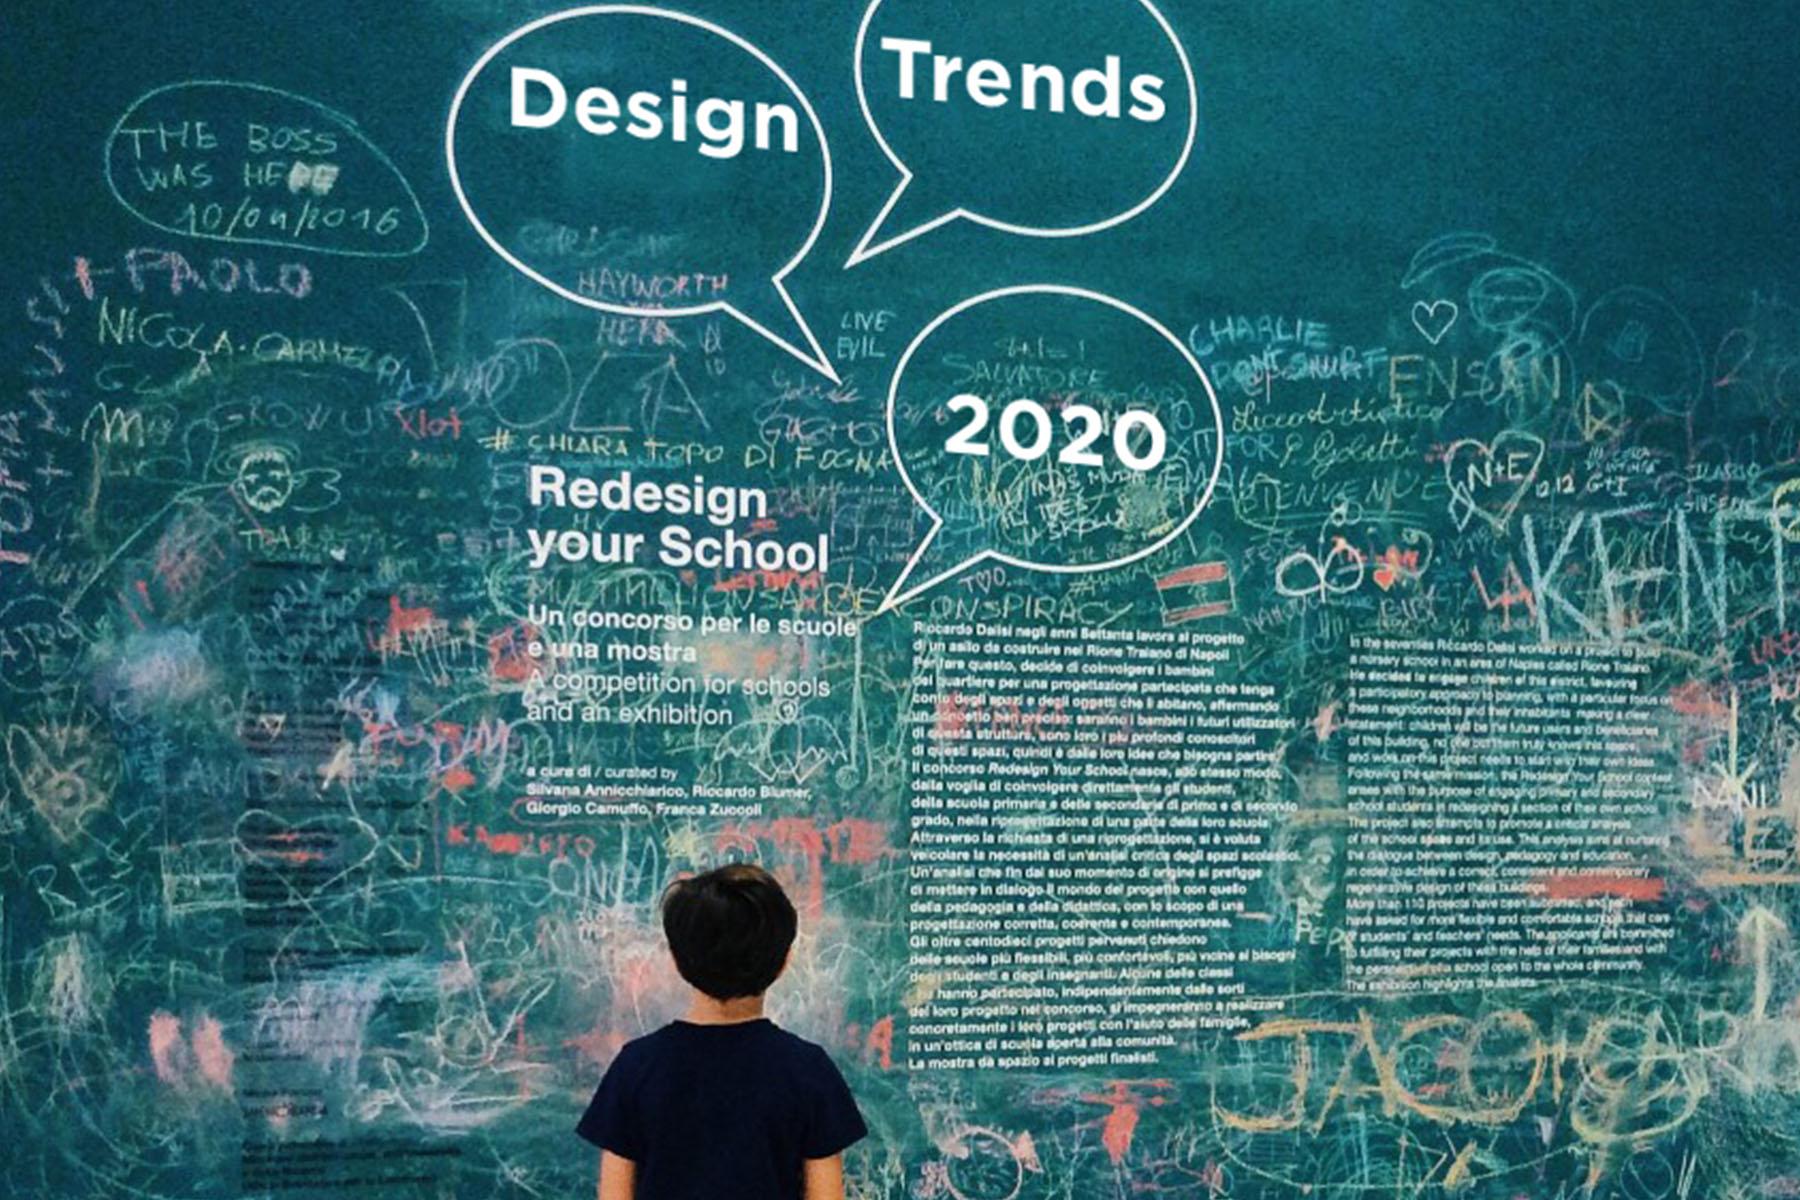 design-trends-designstrend-1